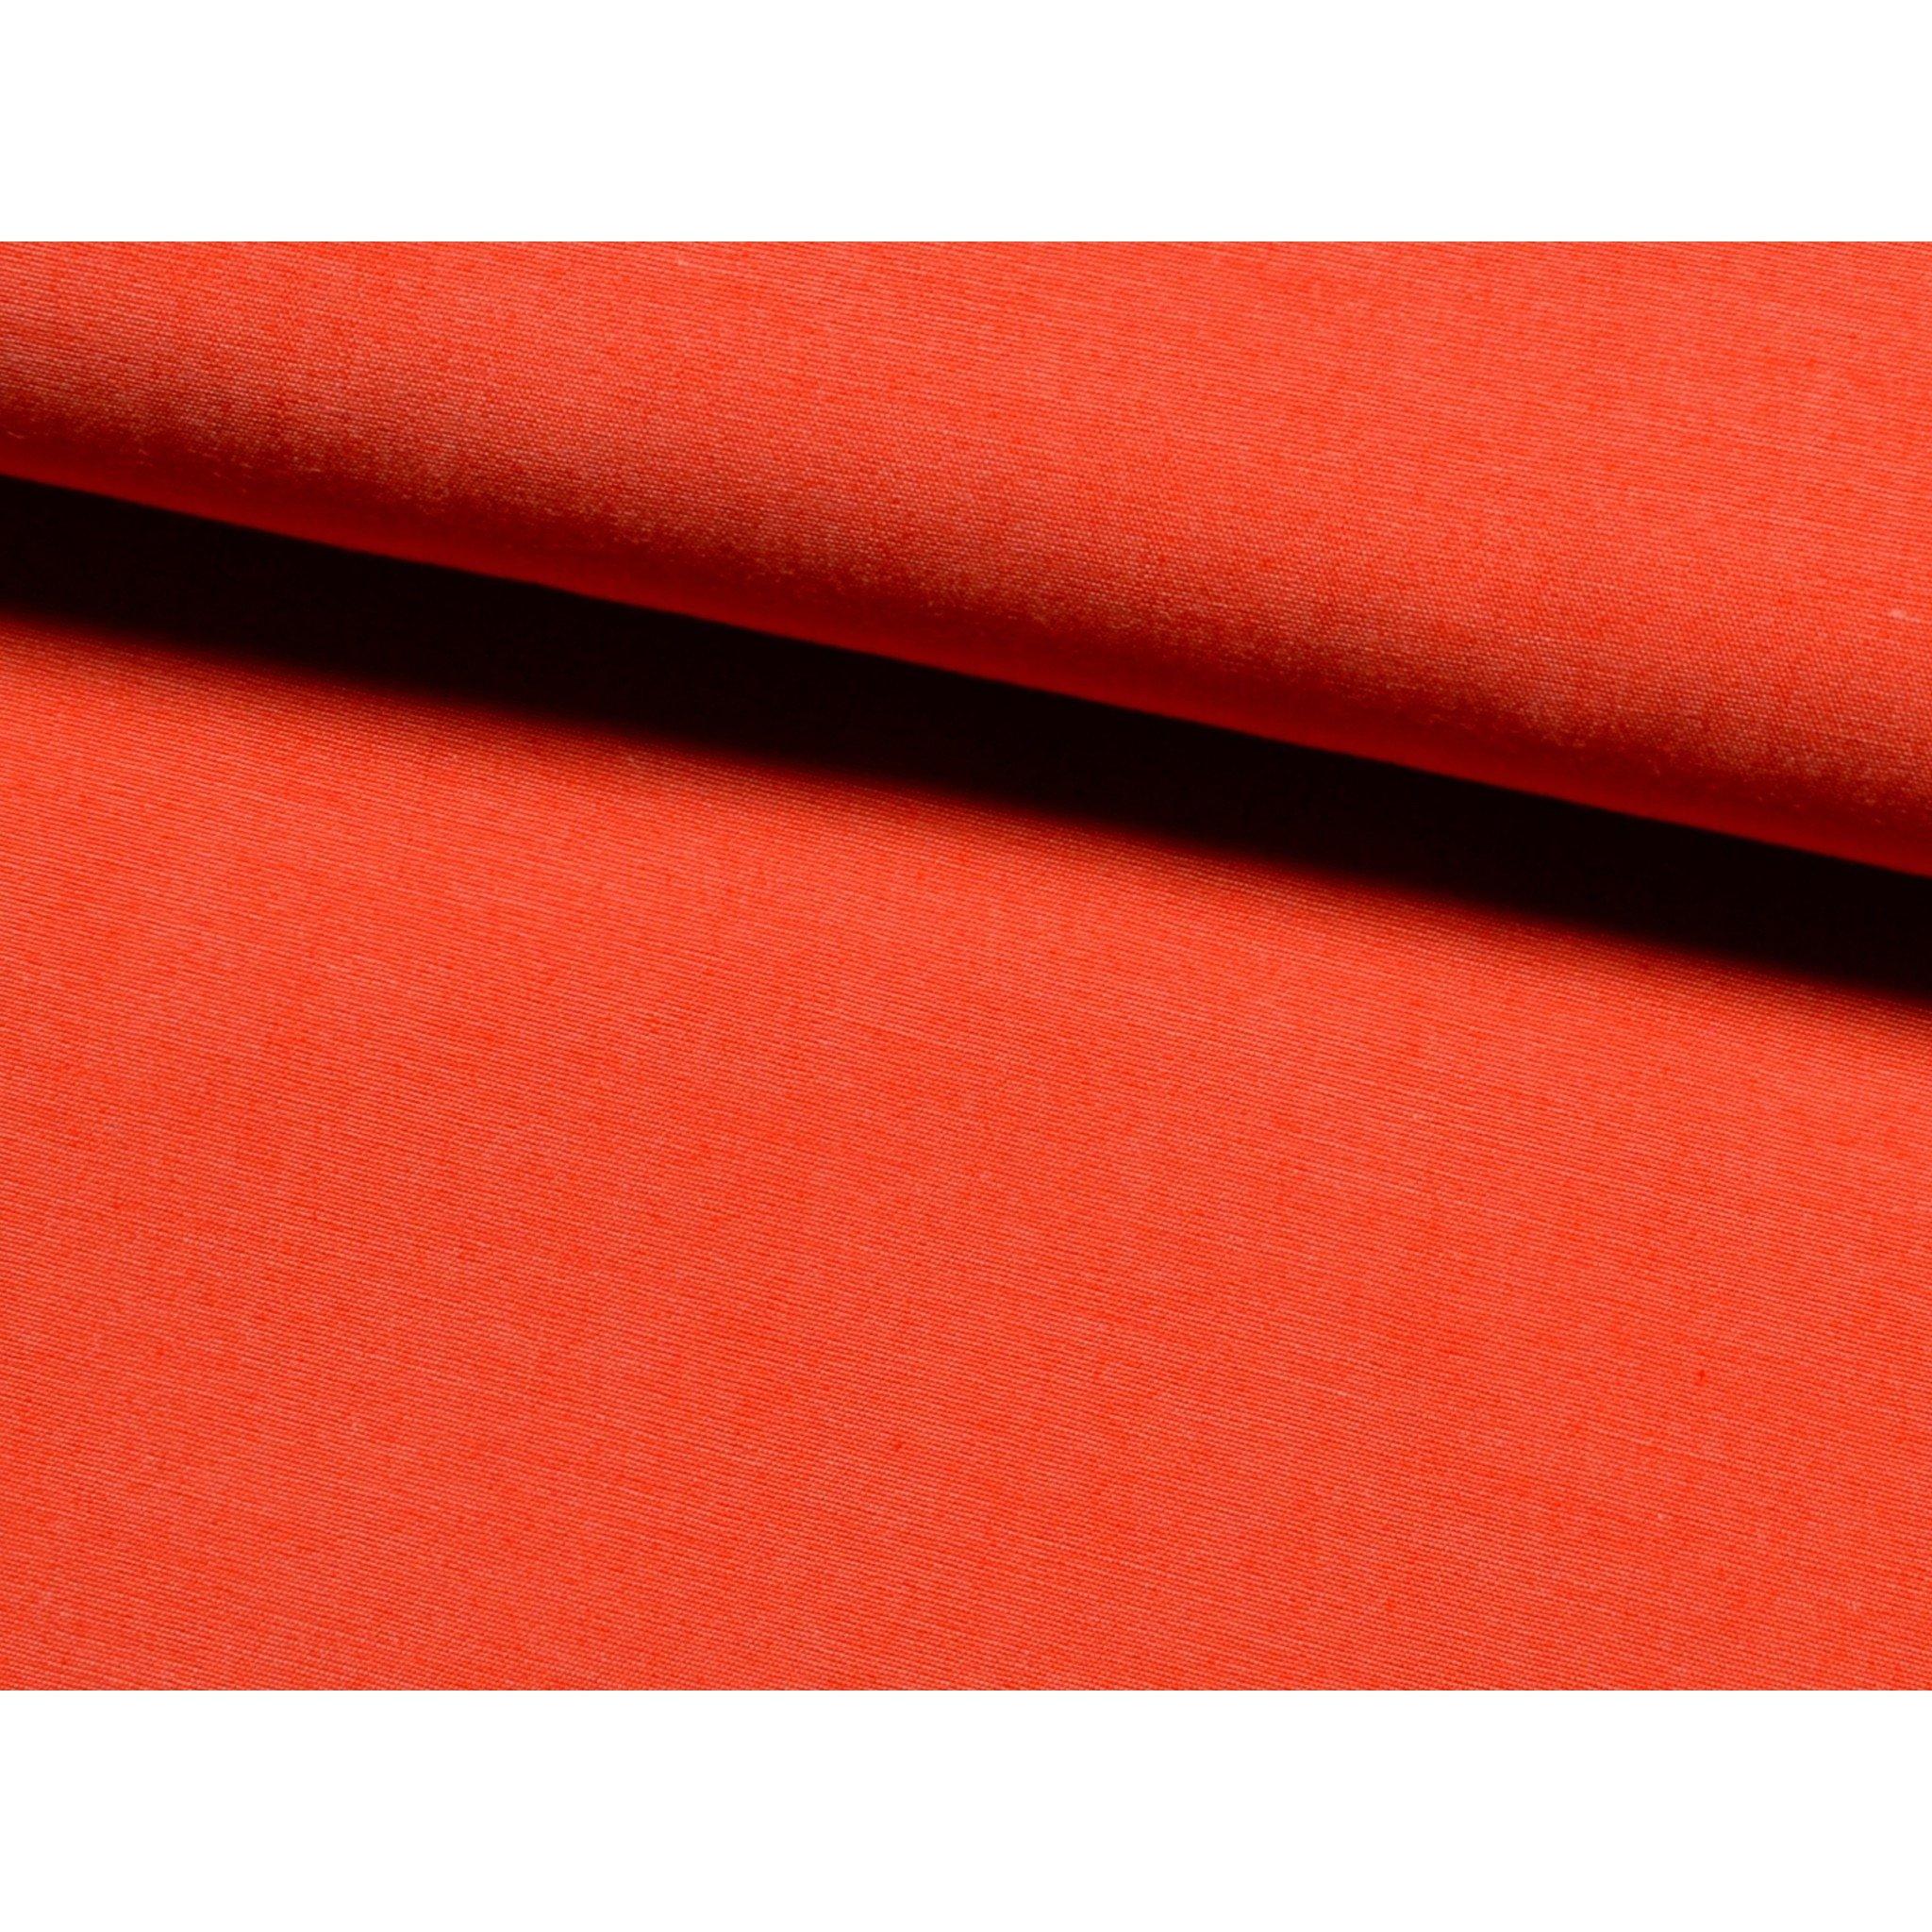 VIBRANT ORANGE – Vintage Apparels